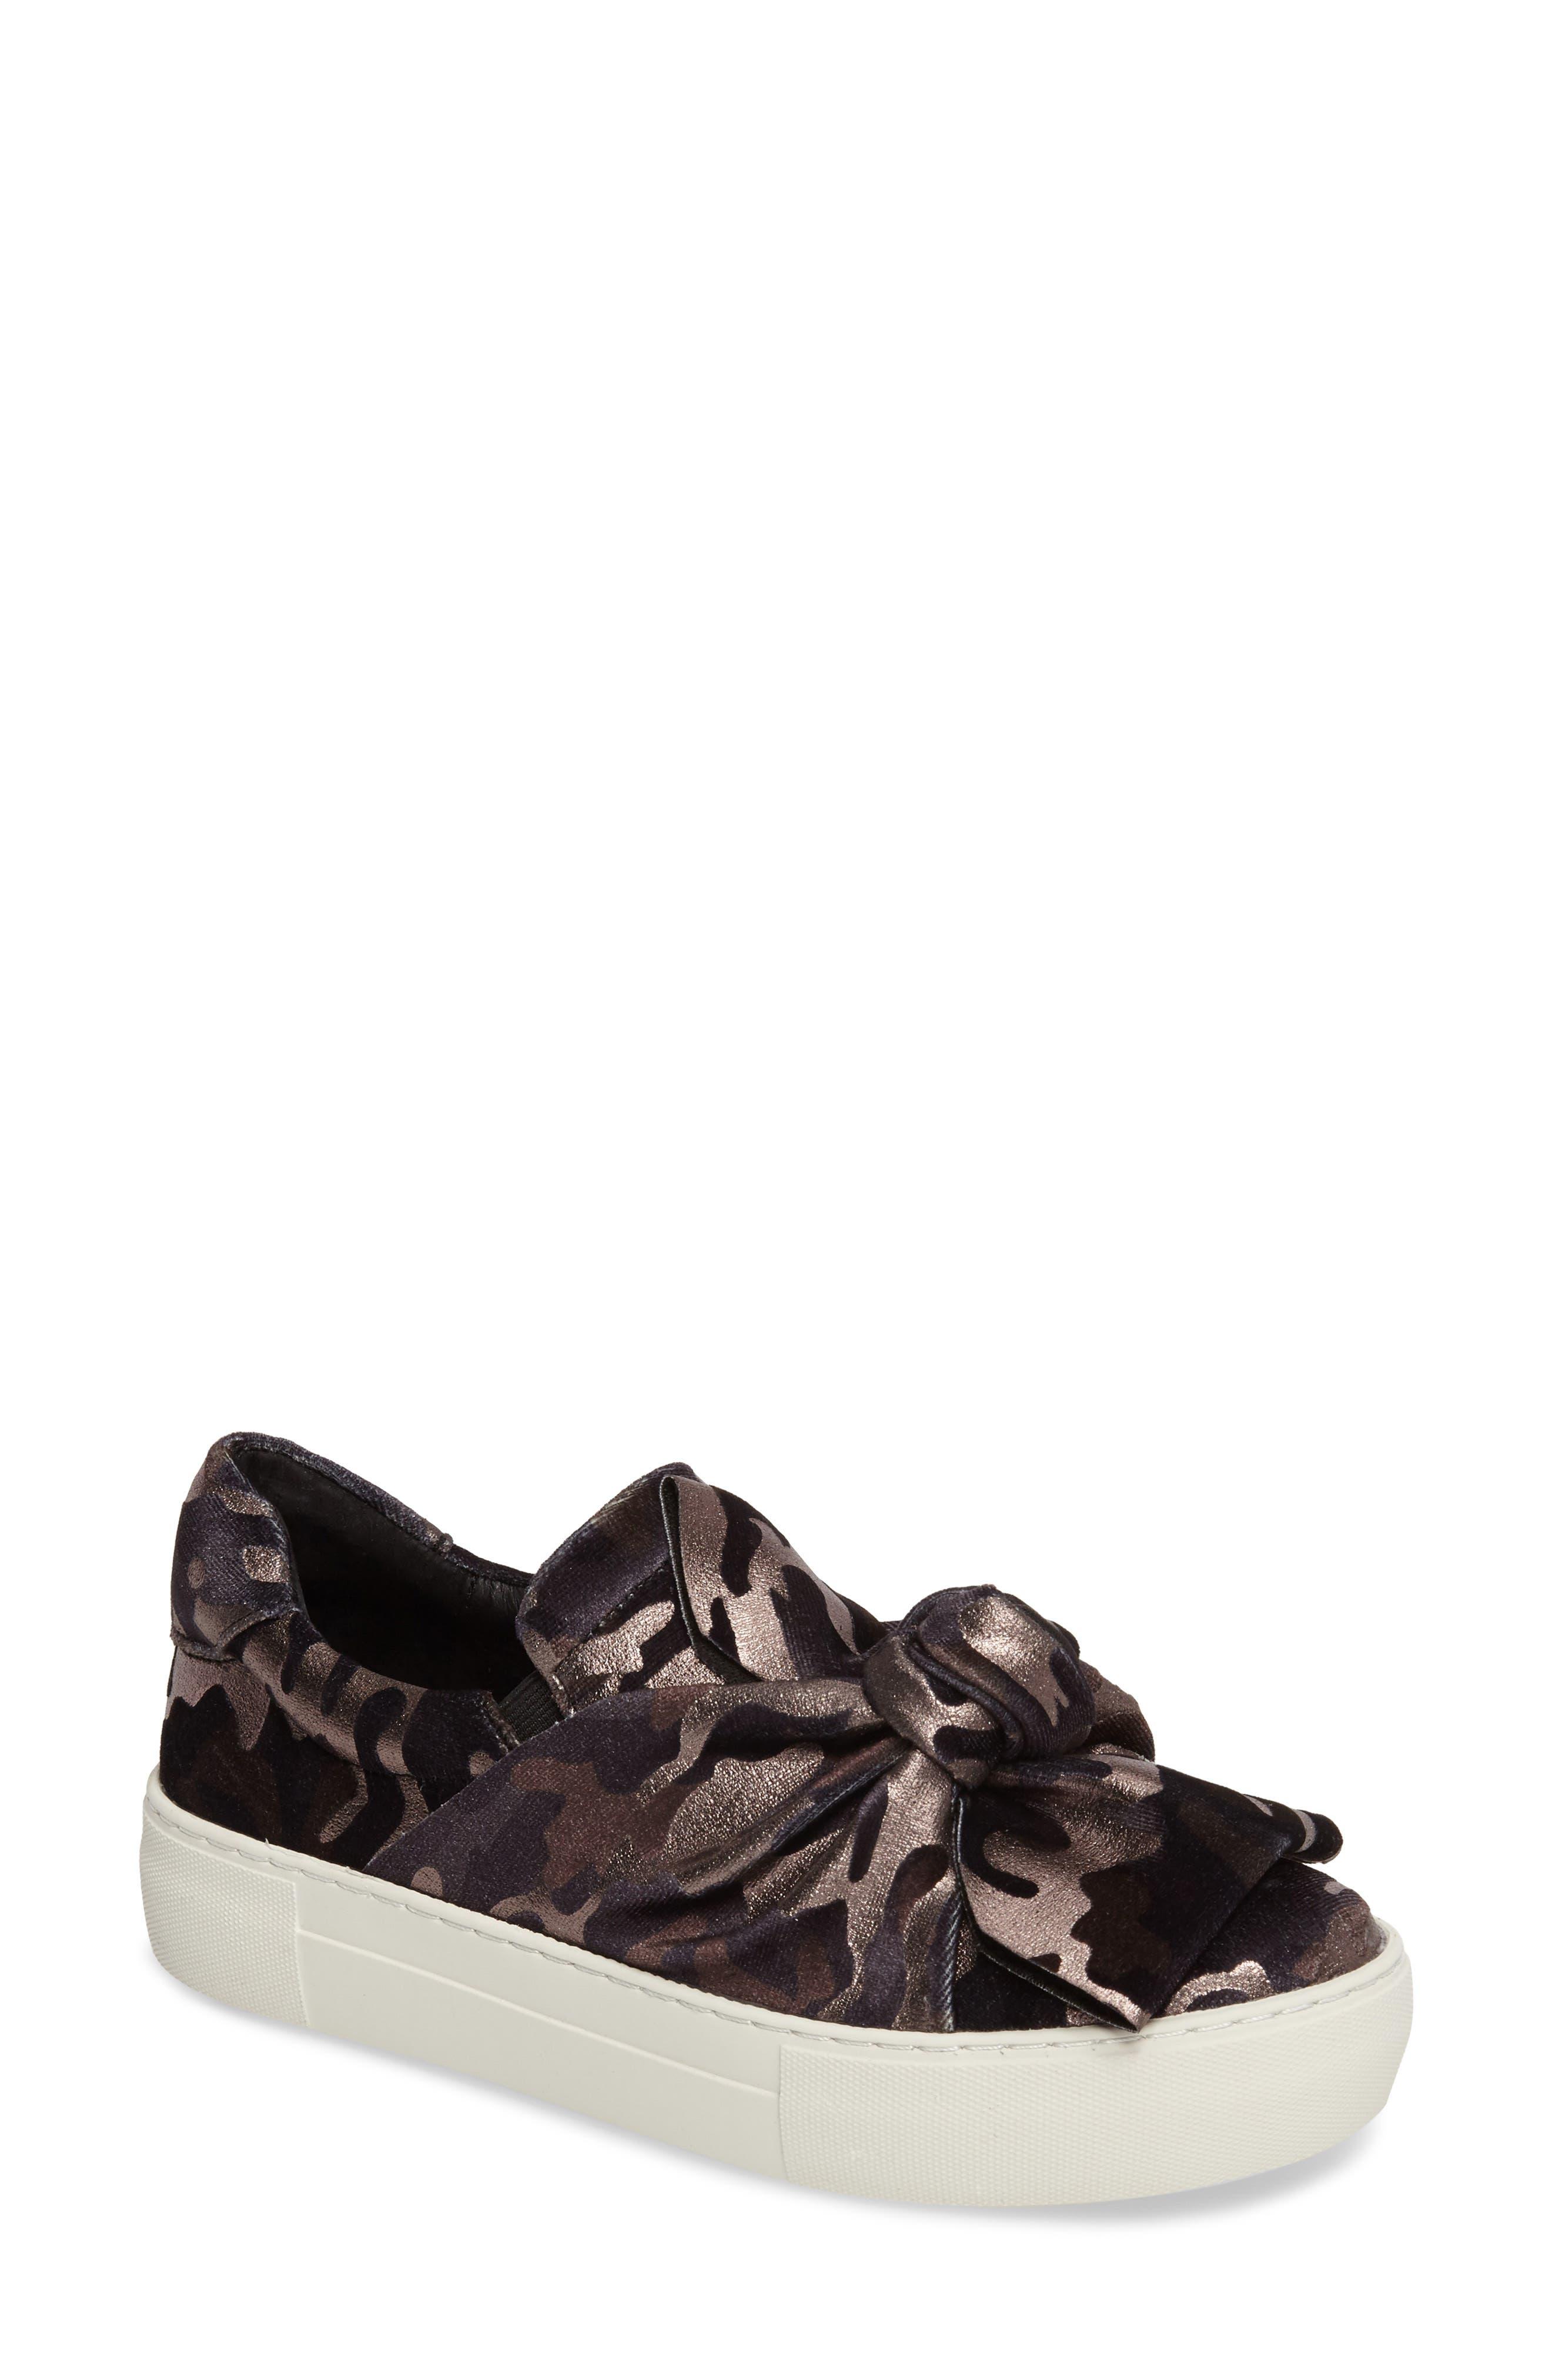 Audra Slip-On Sneaker,                         Main,                         color, Black Camo Fabric